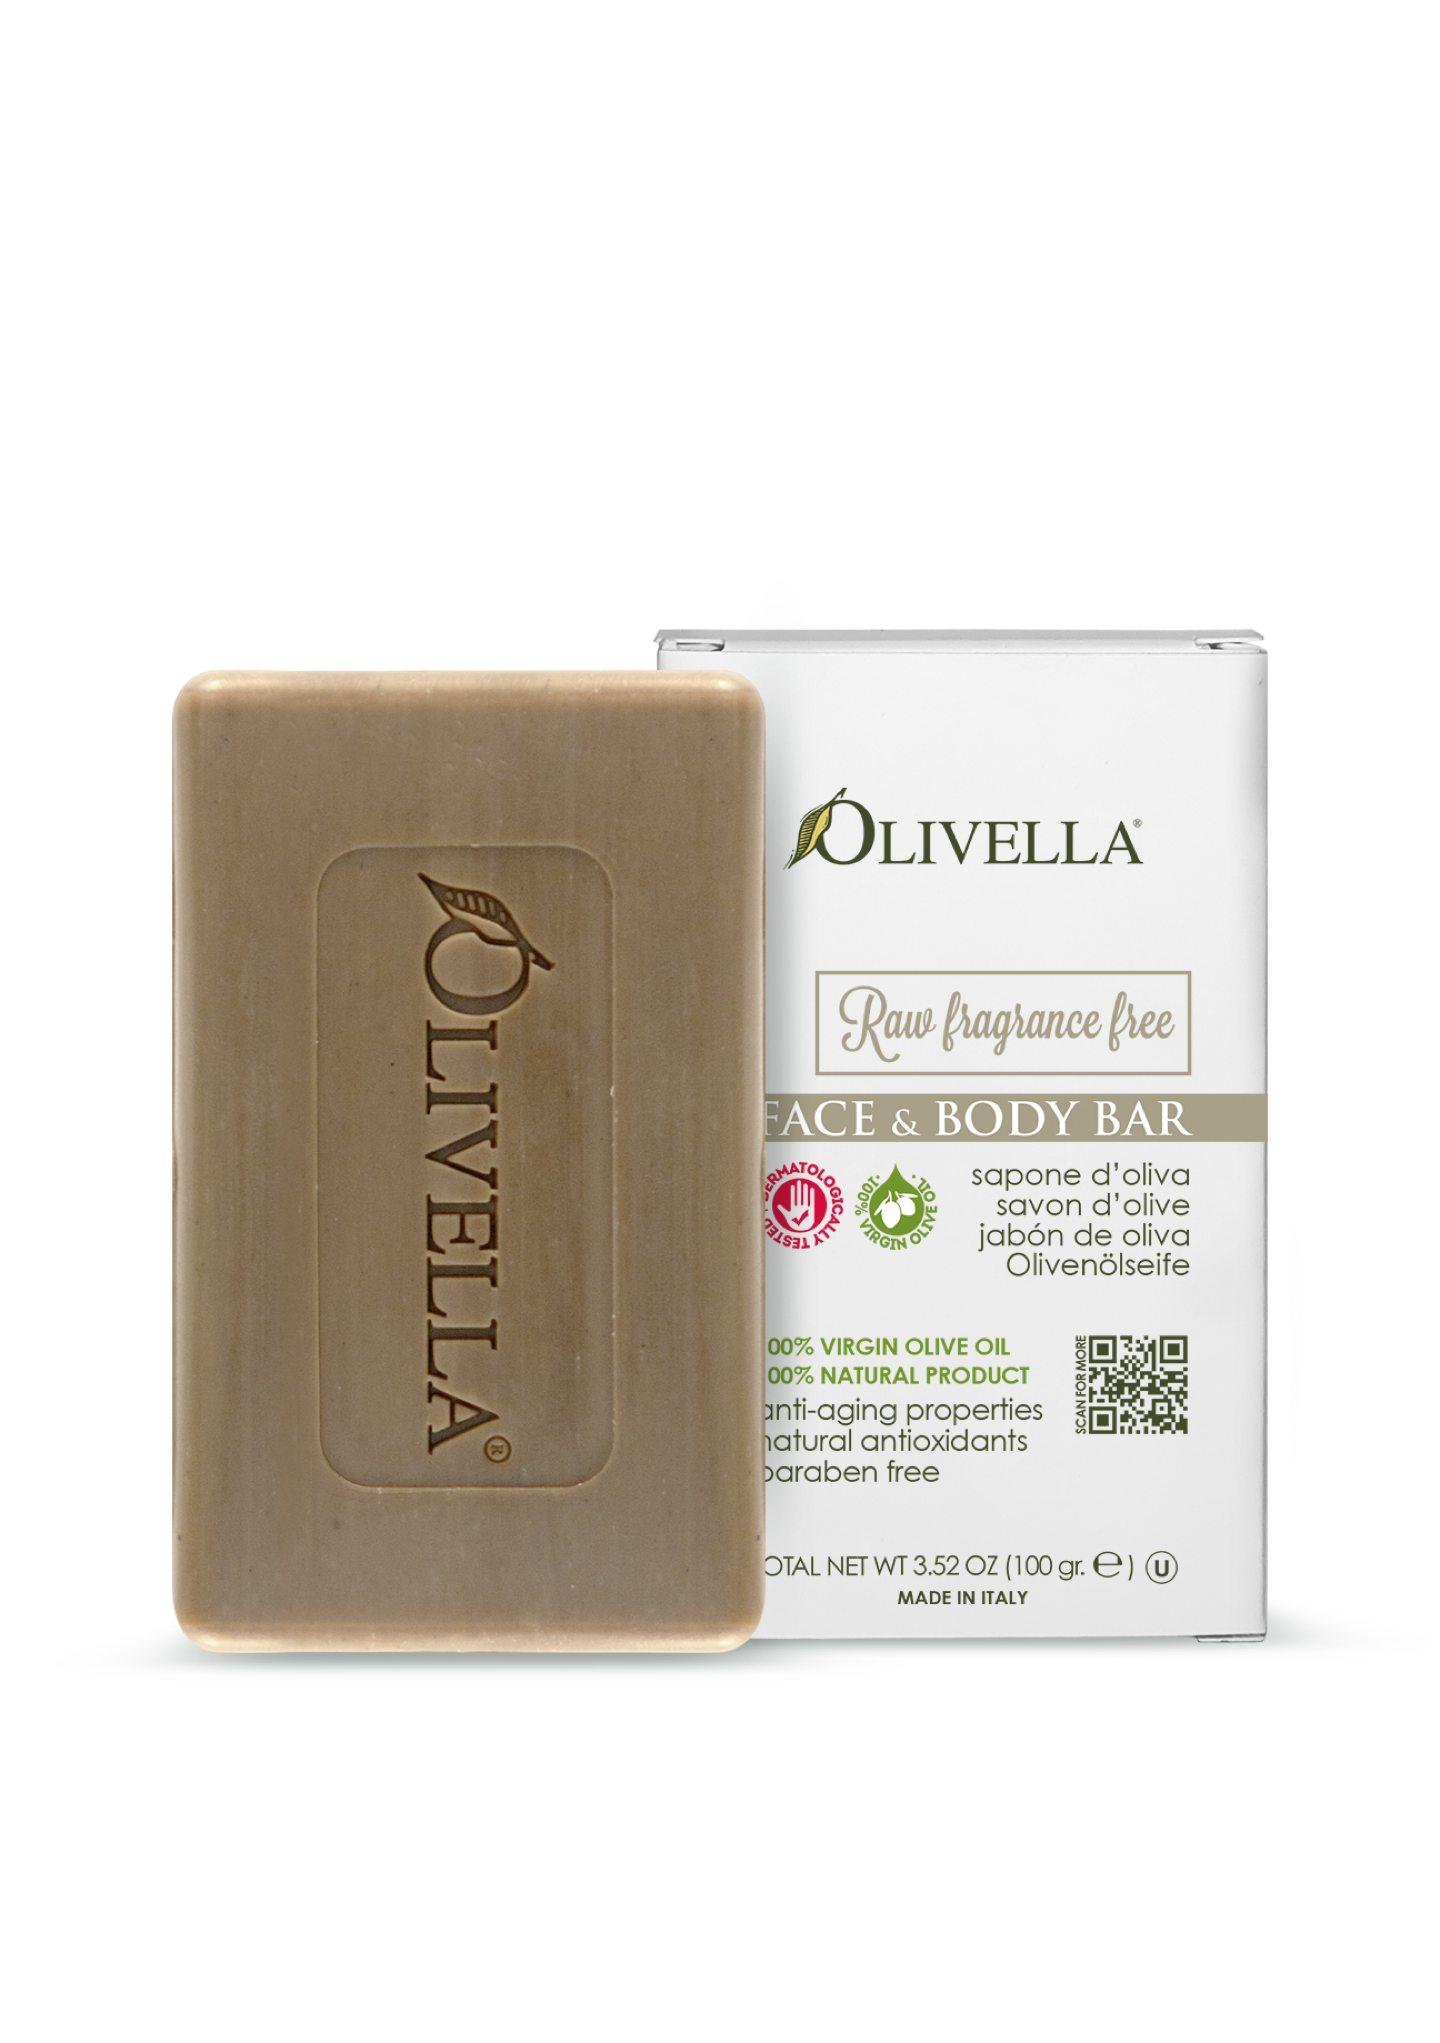 Olivella Face & Body Bar Soap - Fragrance-free